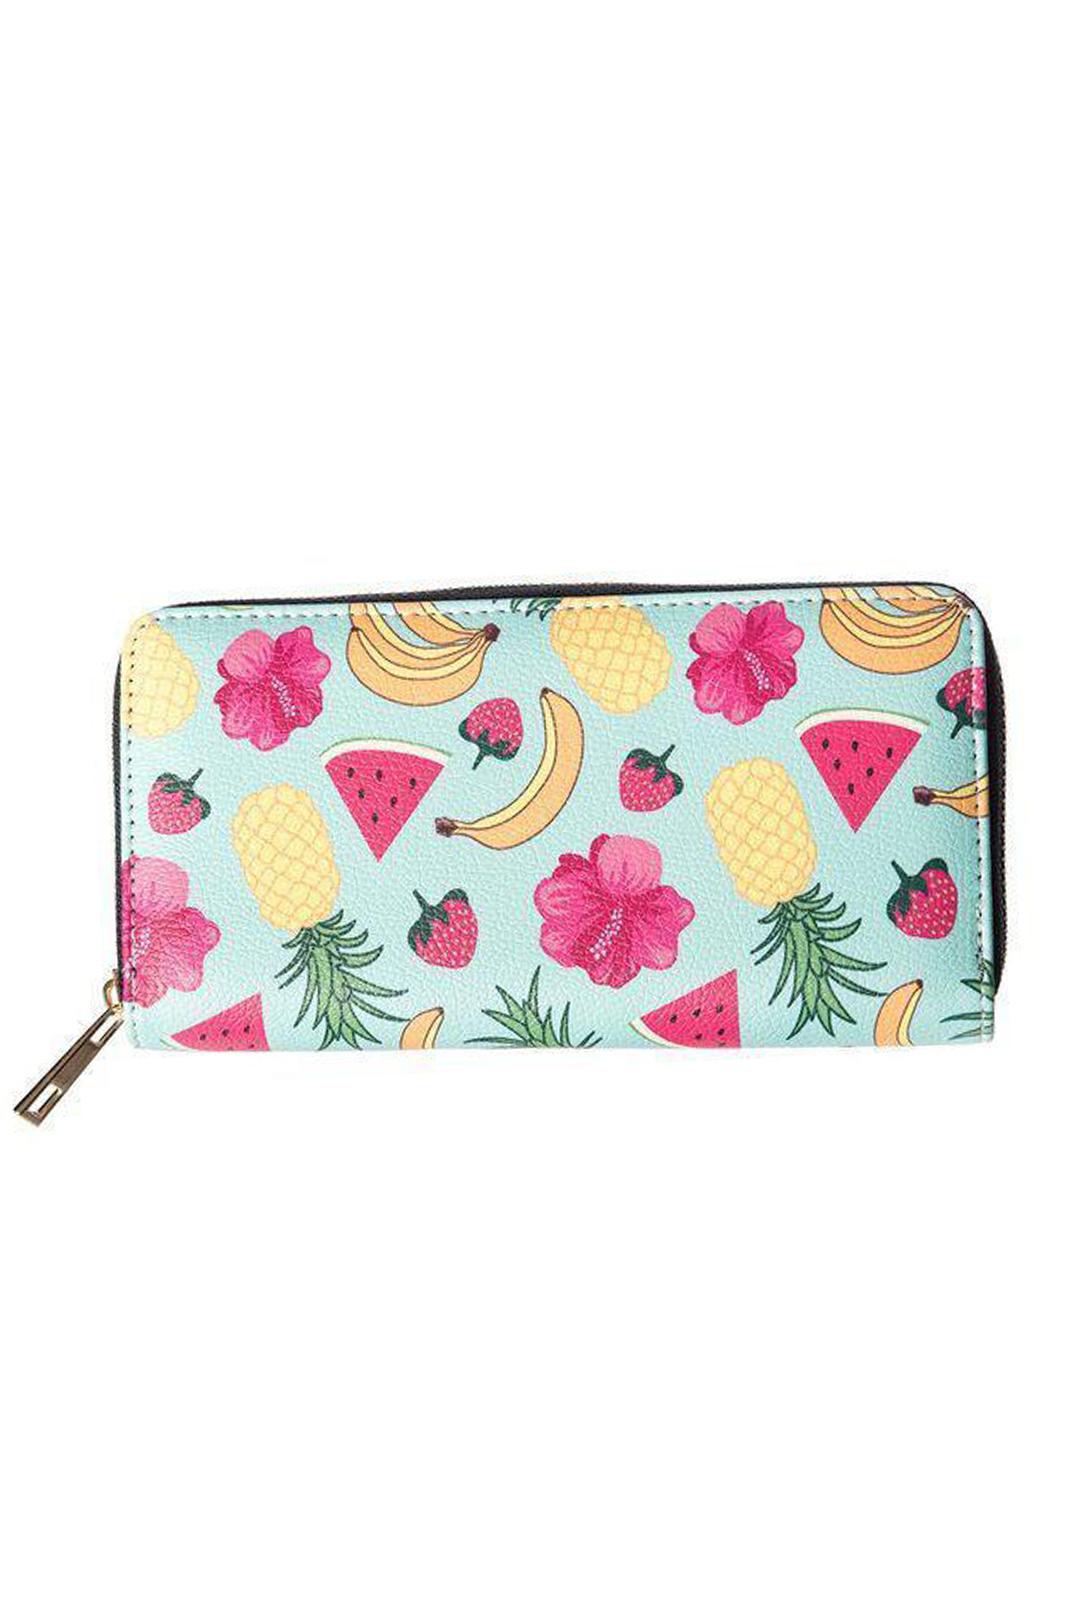 Tutti Frutti Wallet